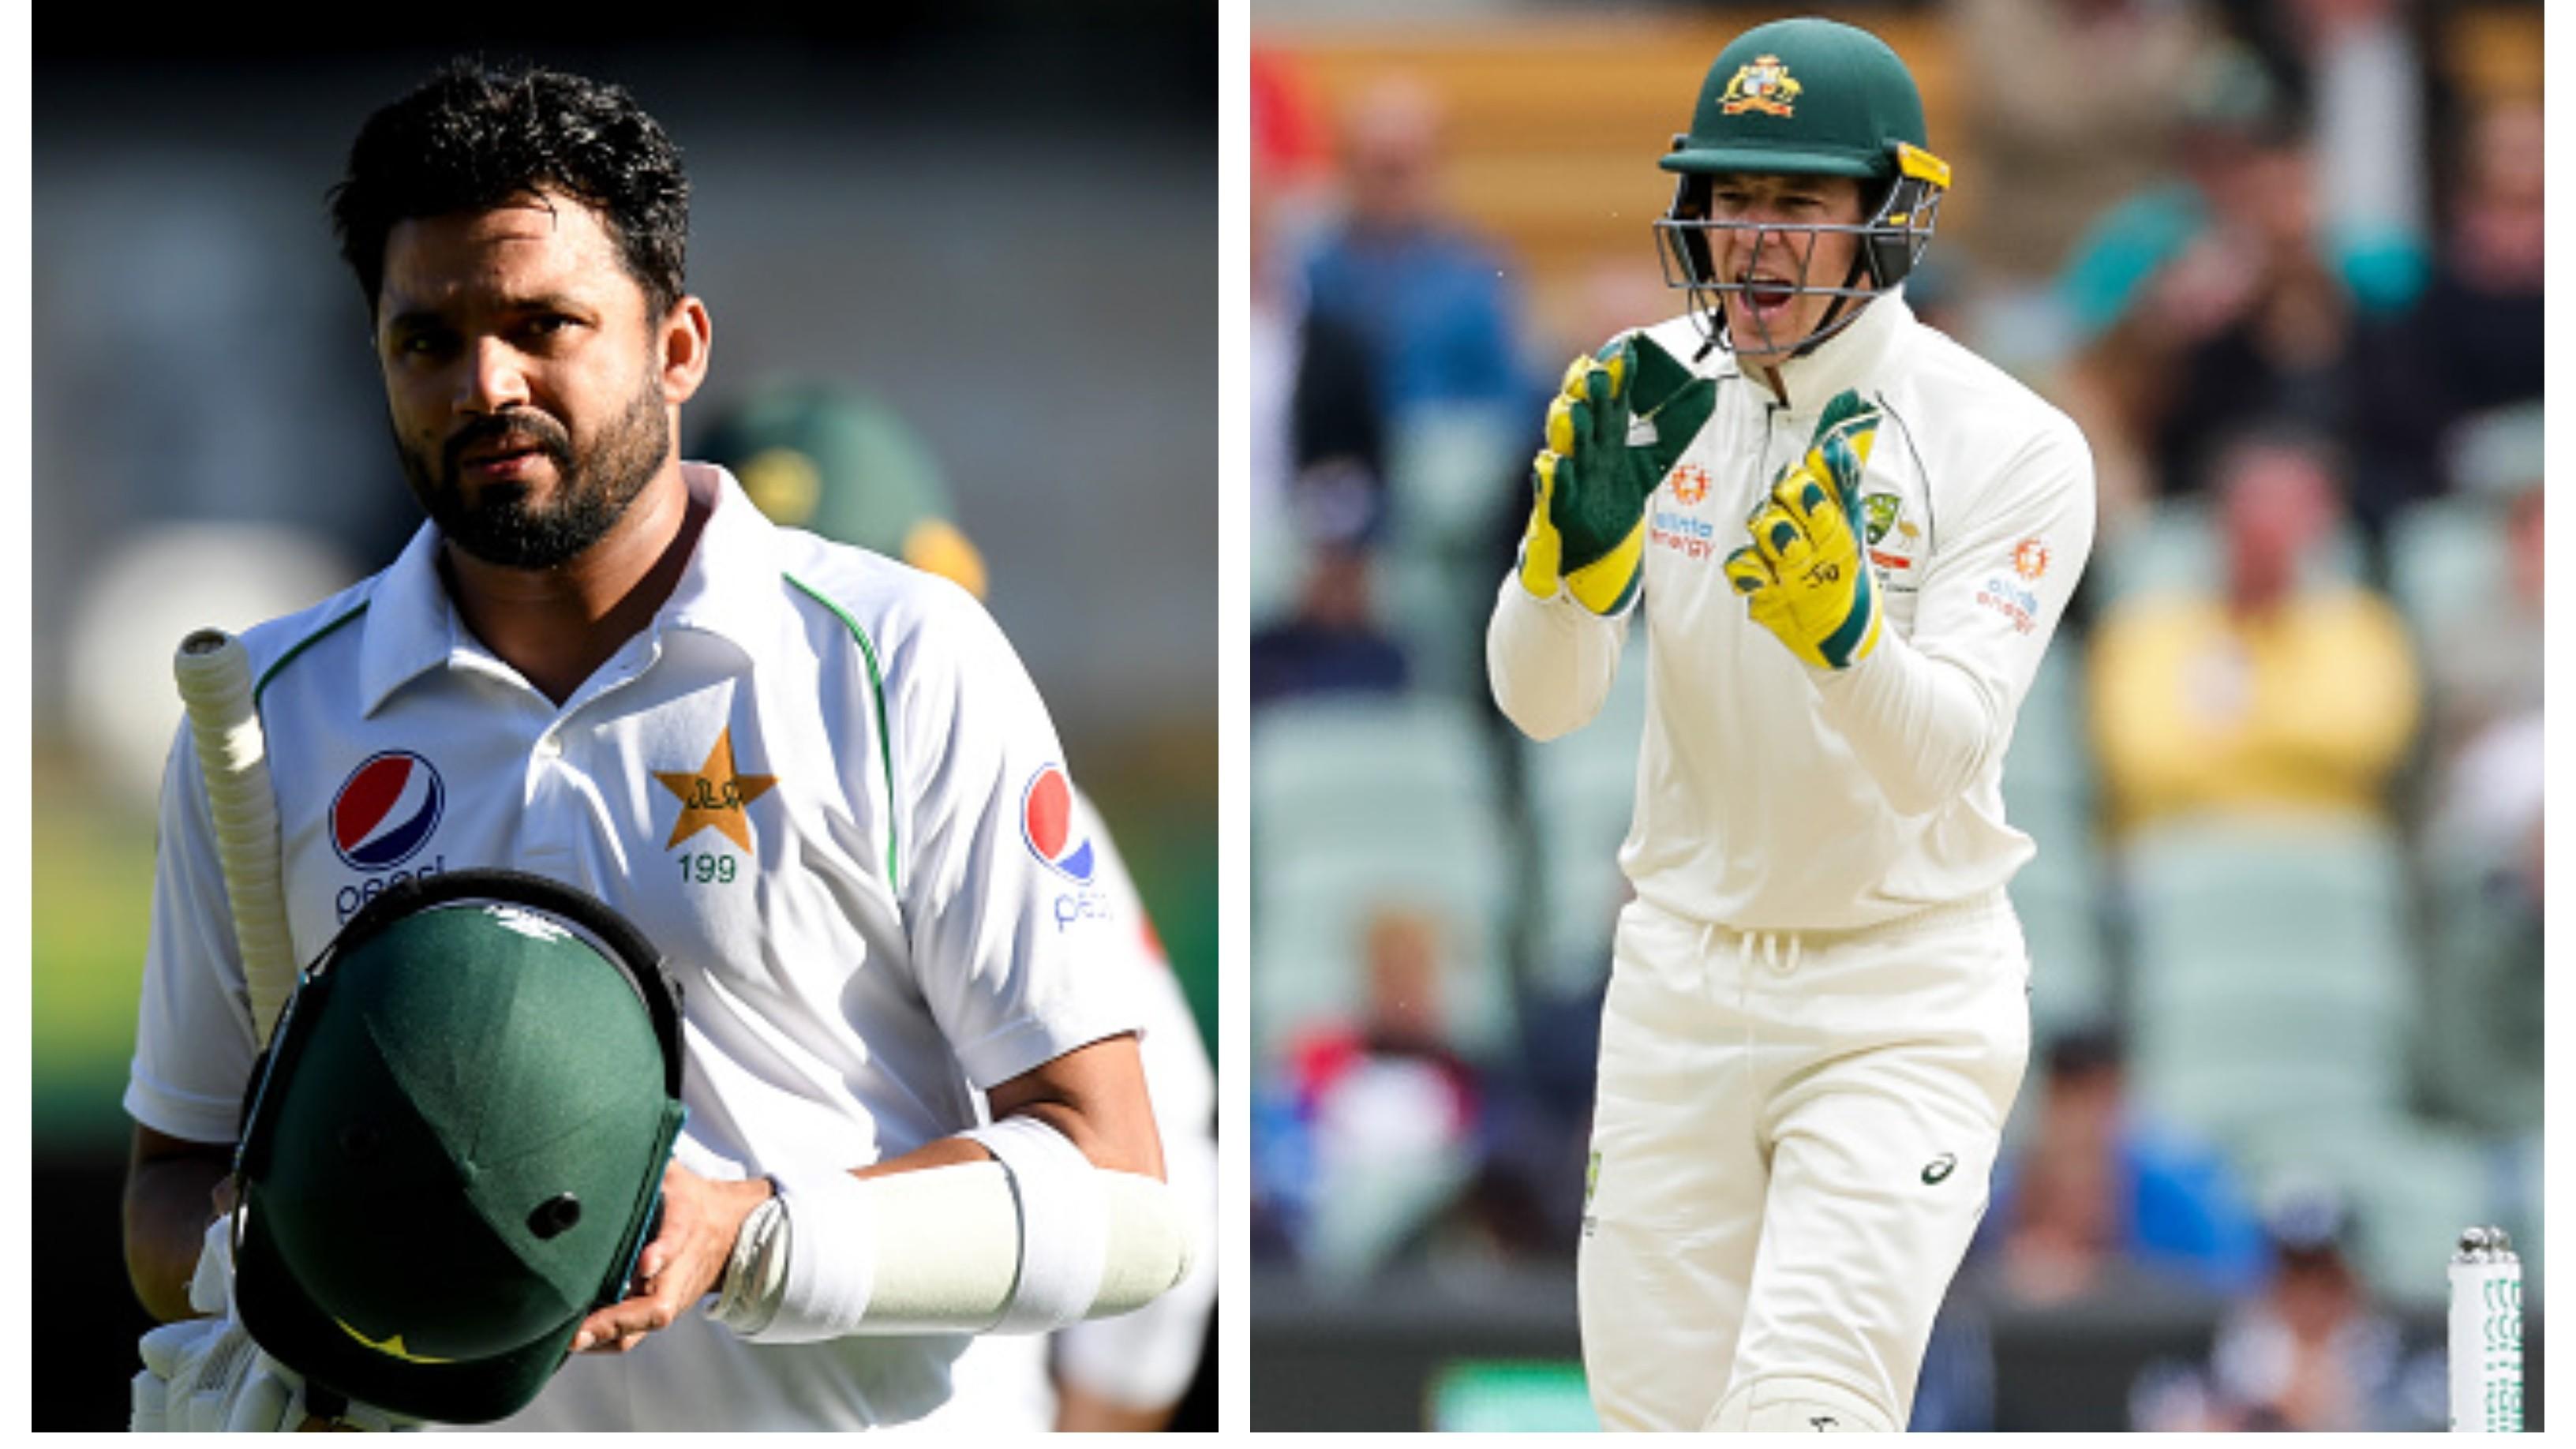 AUS v PAK 2019: Tim Paine, Azhar Ali react after Australia's 2-0 Test series sweep